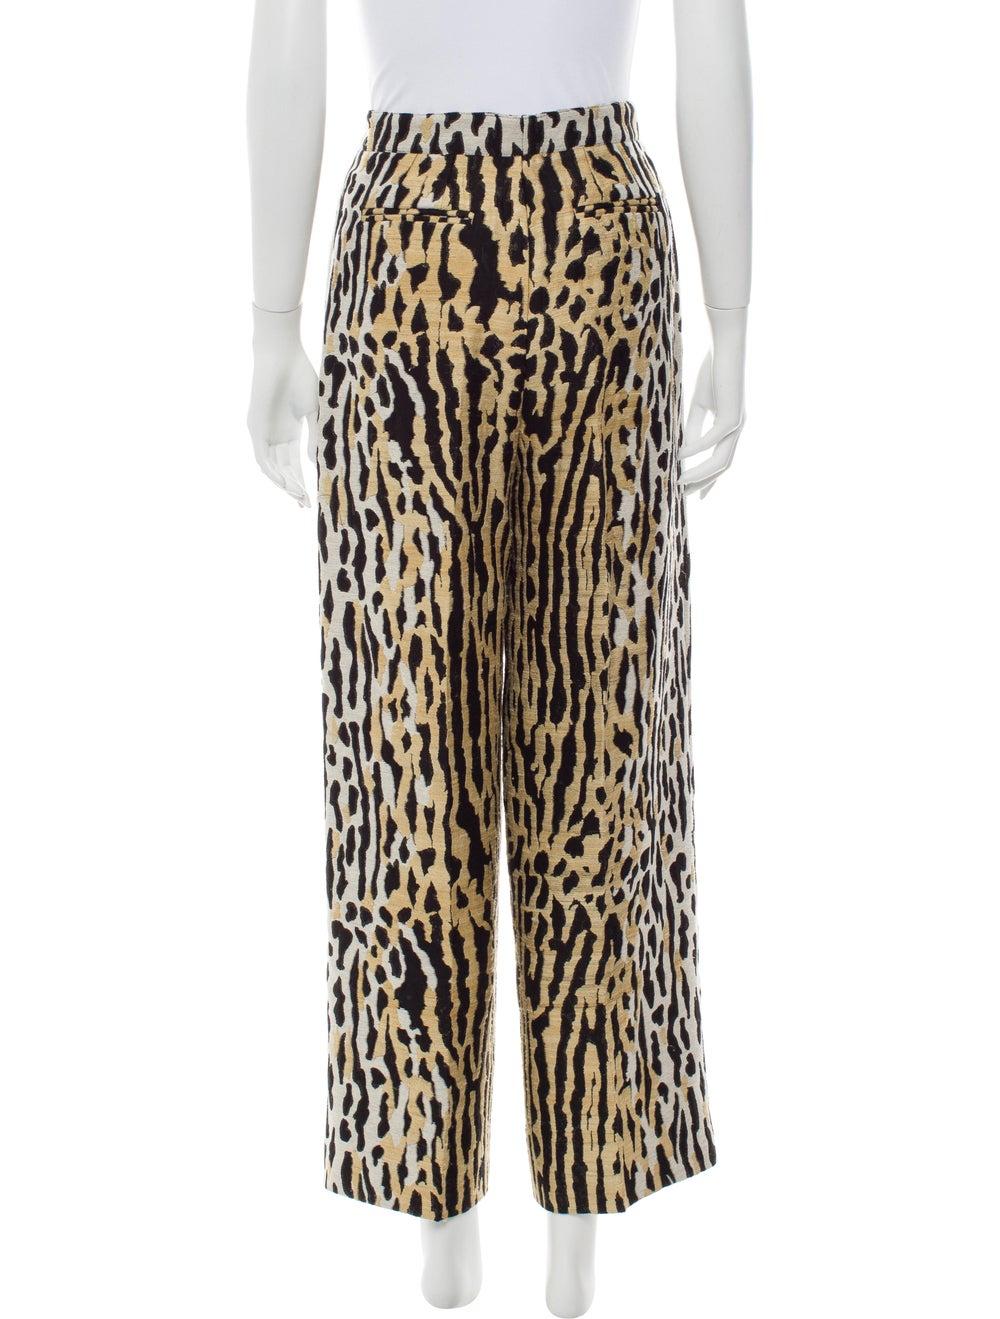 Valentino Animal Print Wide Leg Pants - image 3